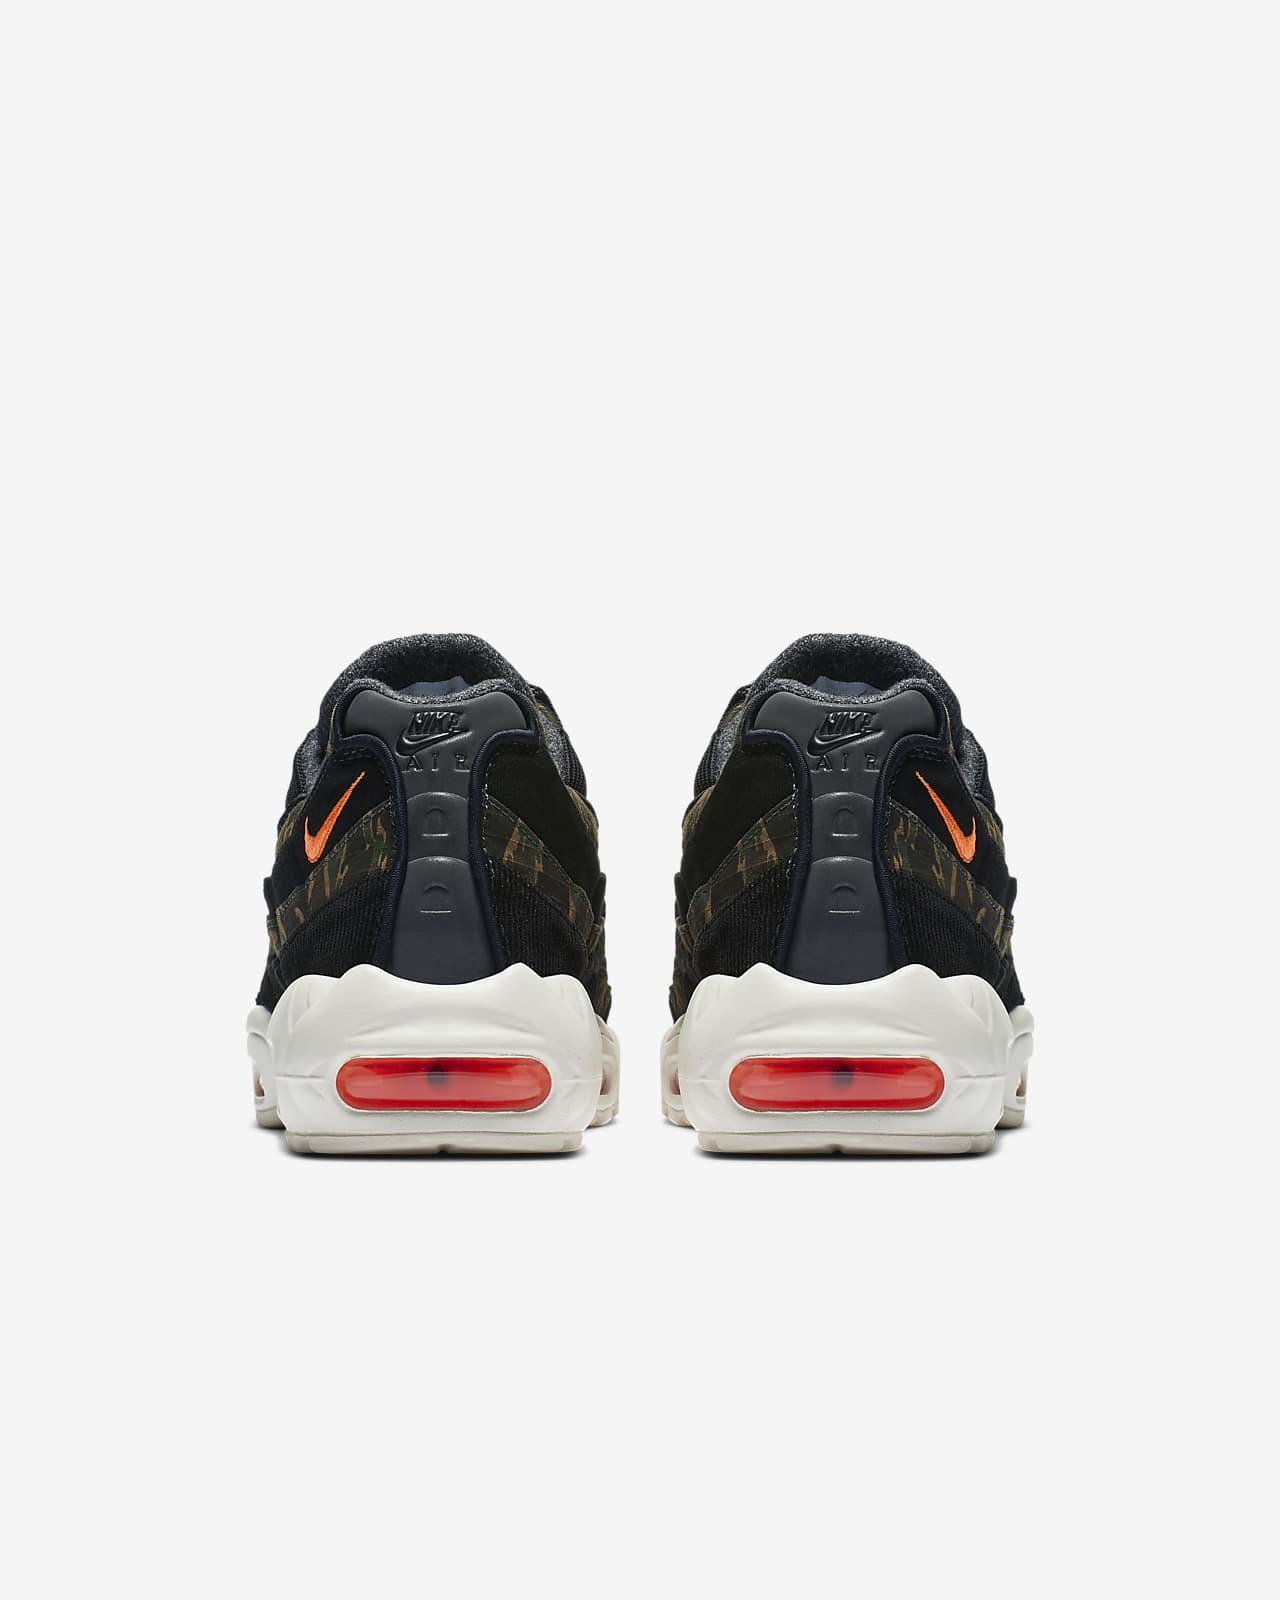 Nike x Carhartt WIP Air Max 95 Men's